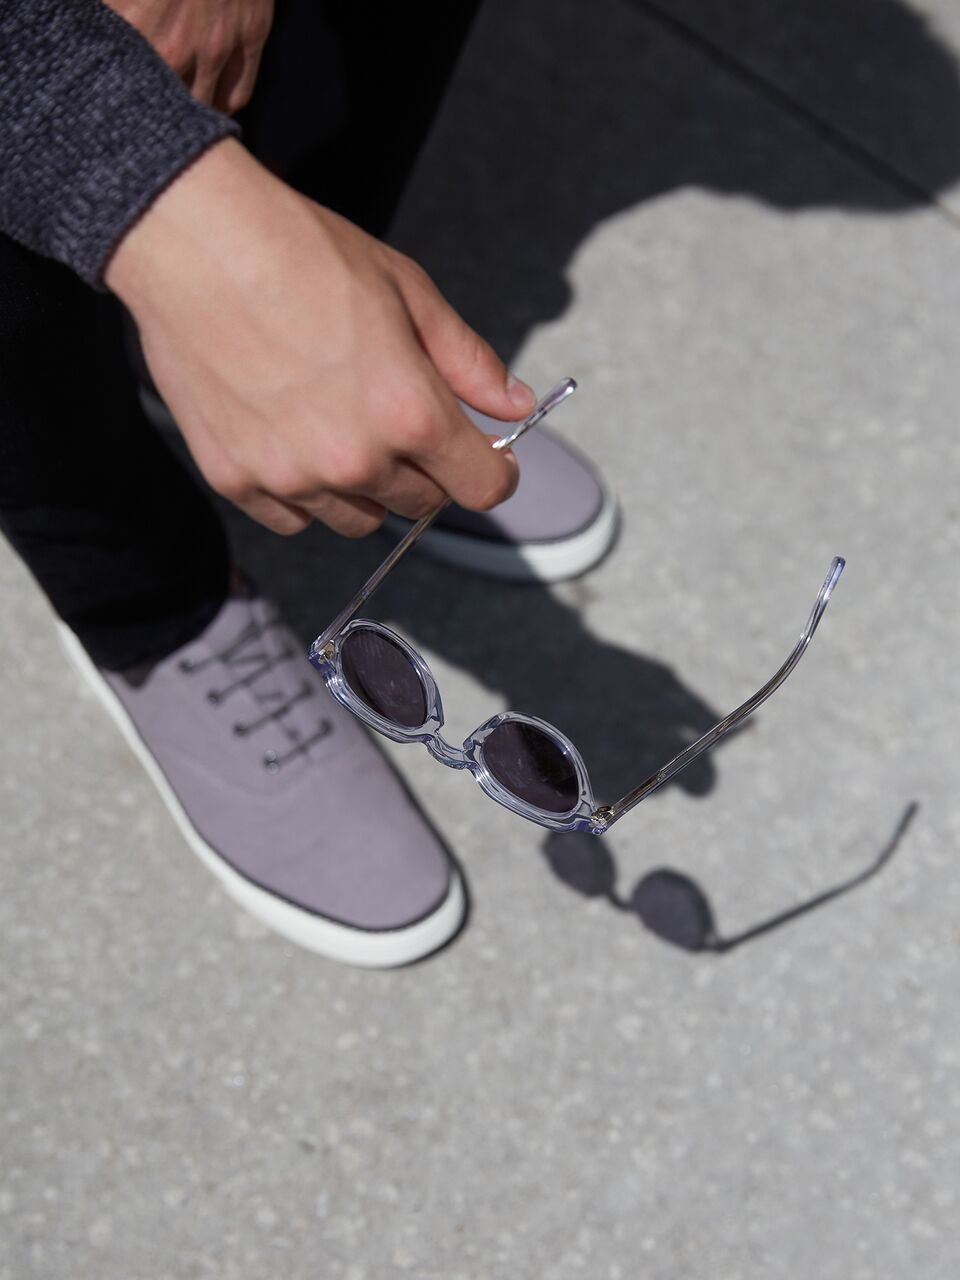 JAR.SunglassesinHand.jpg